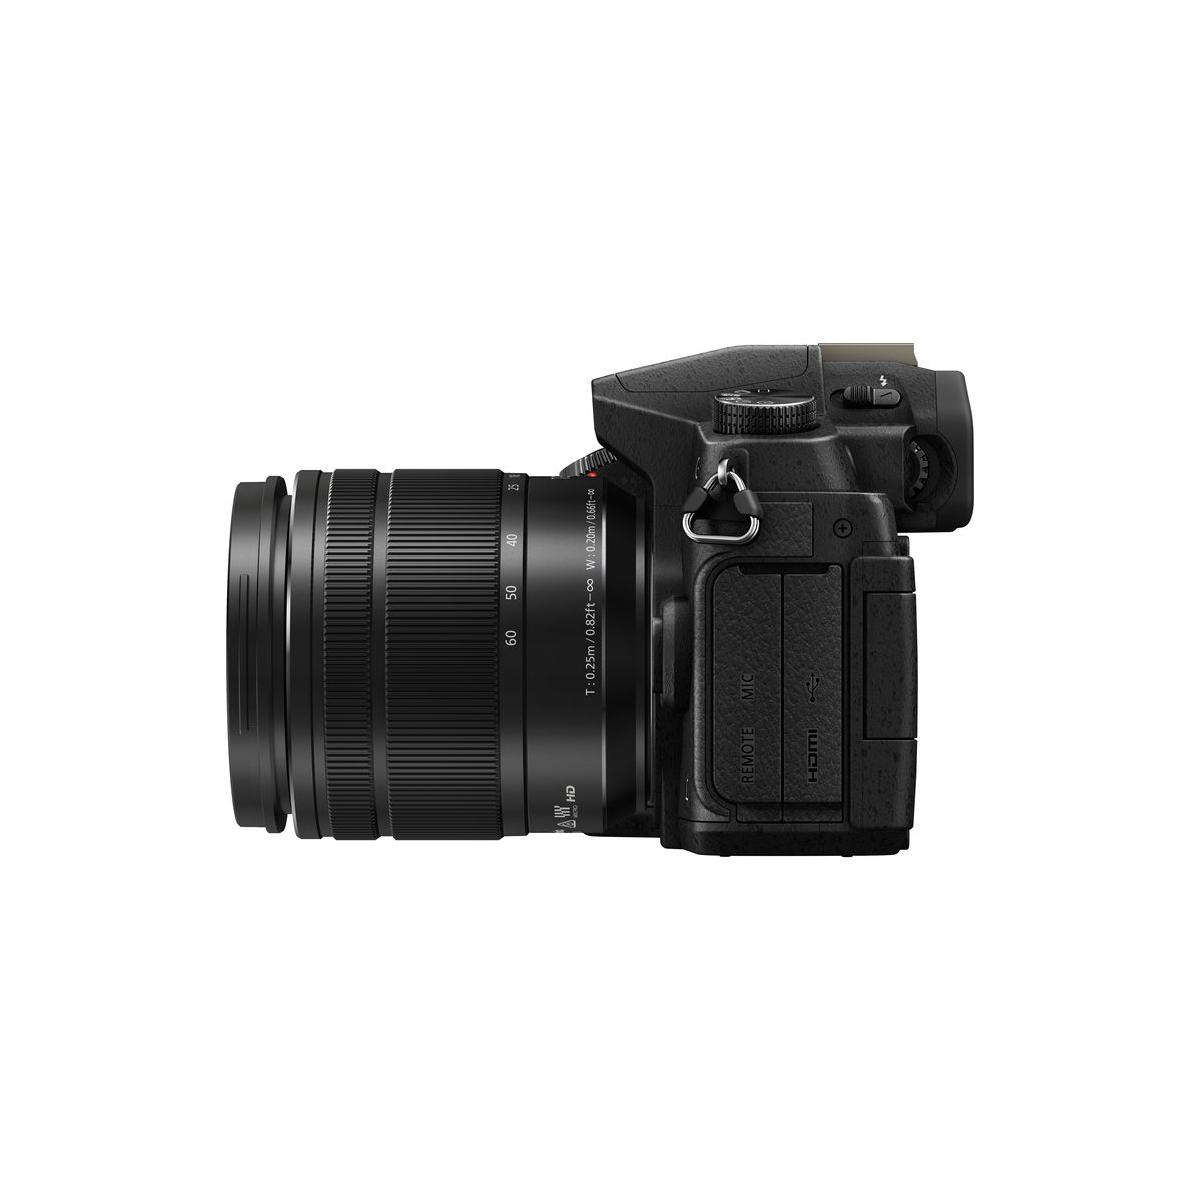 Panasonic Lumix DMC-G85 Mirrorless Camera w/ 12-60mm Lens – The